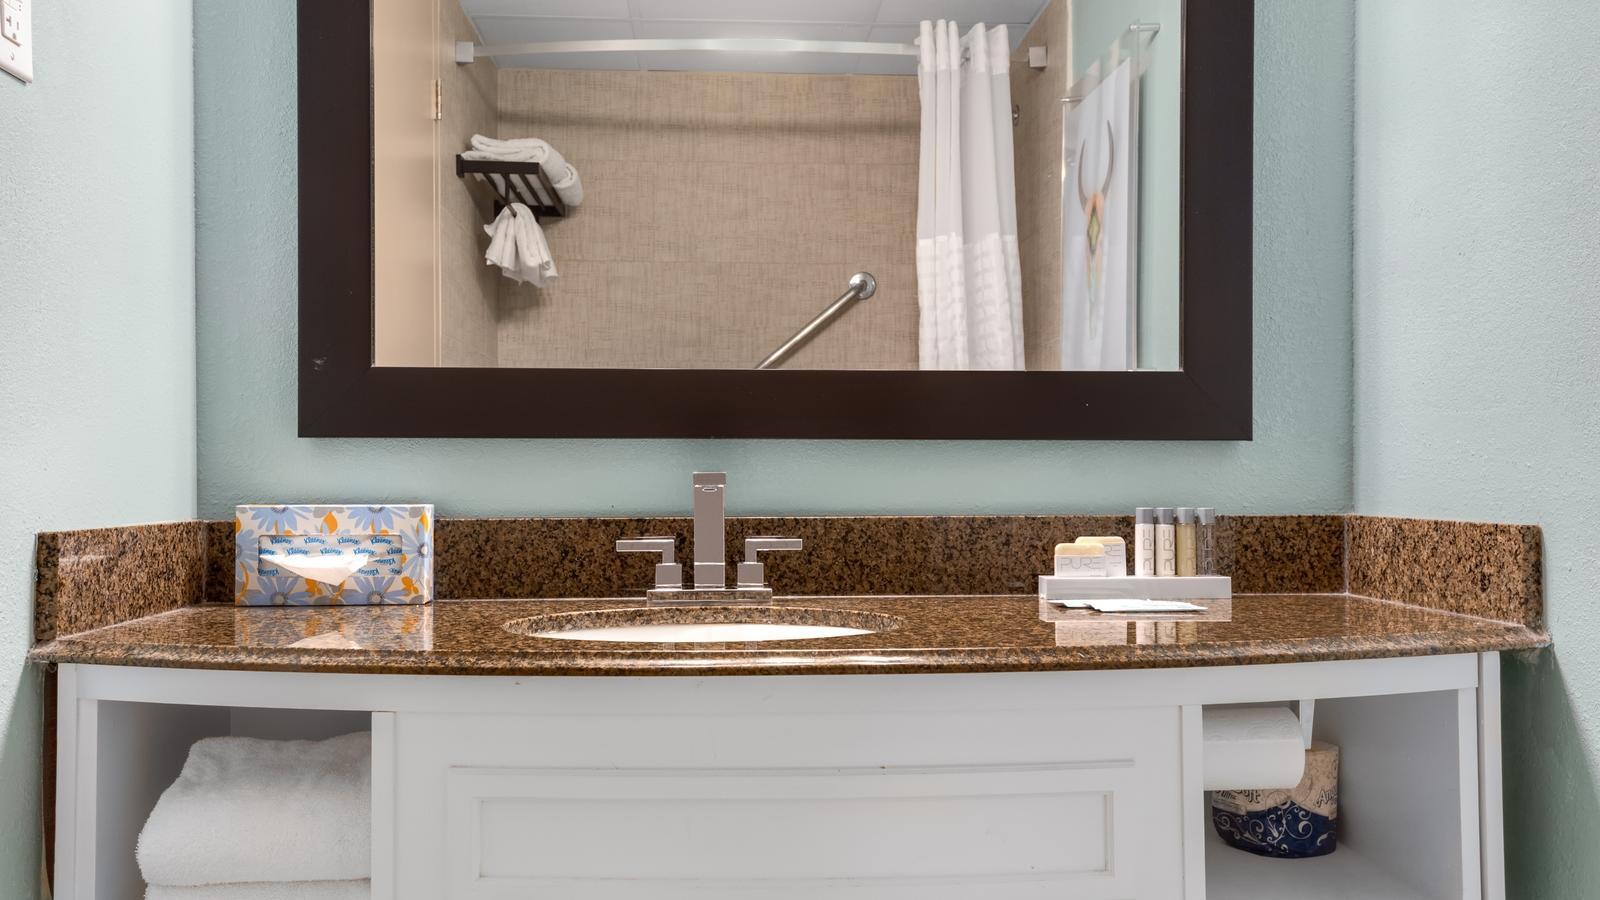 Bathroom vanity with bath amenities